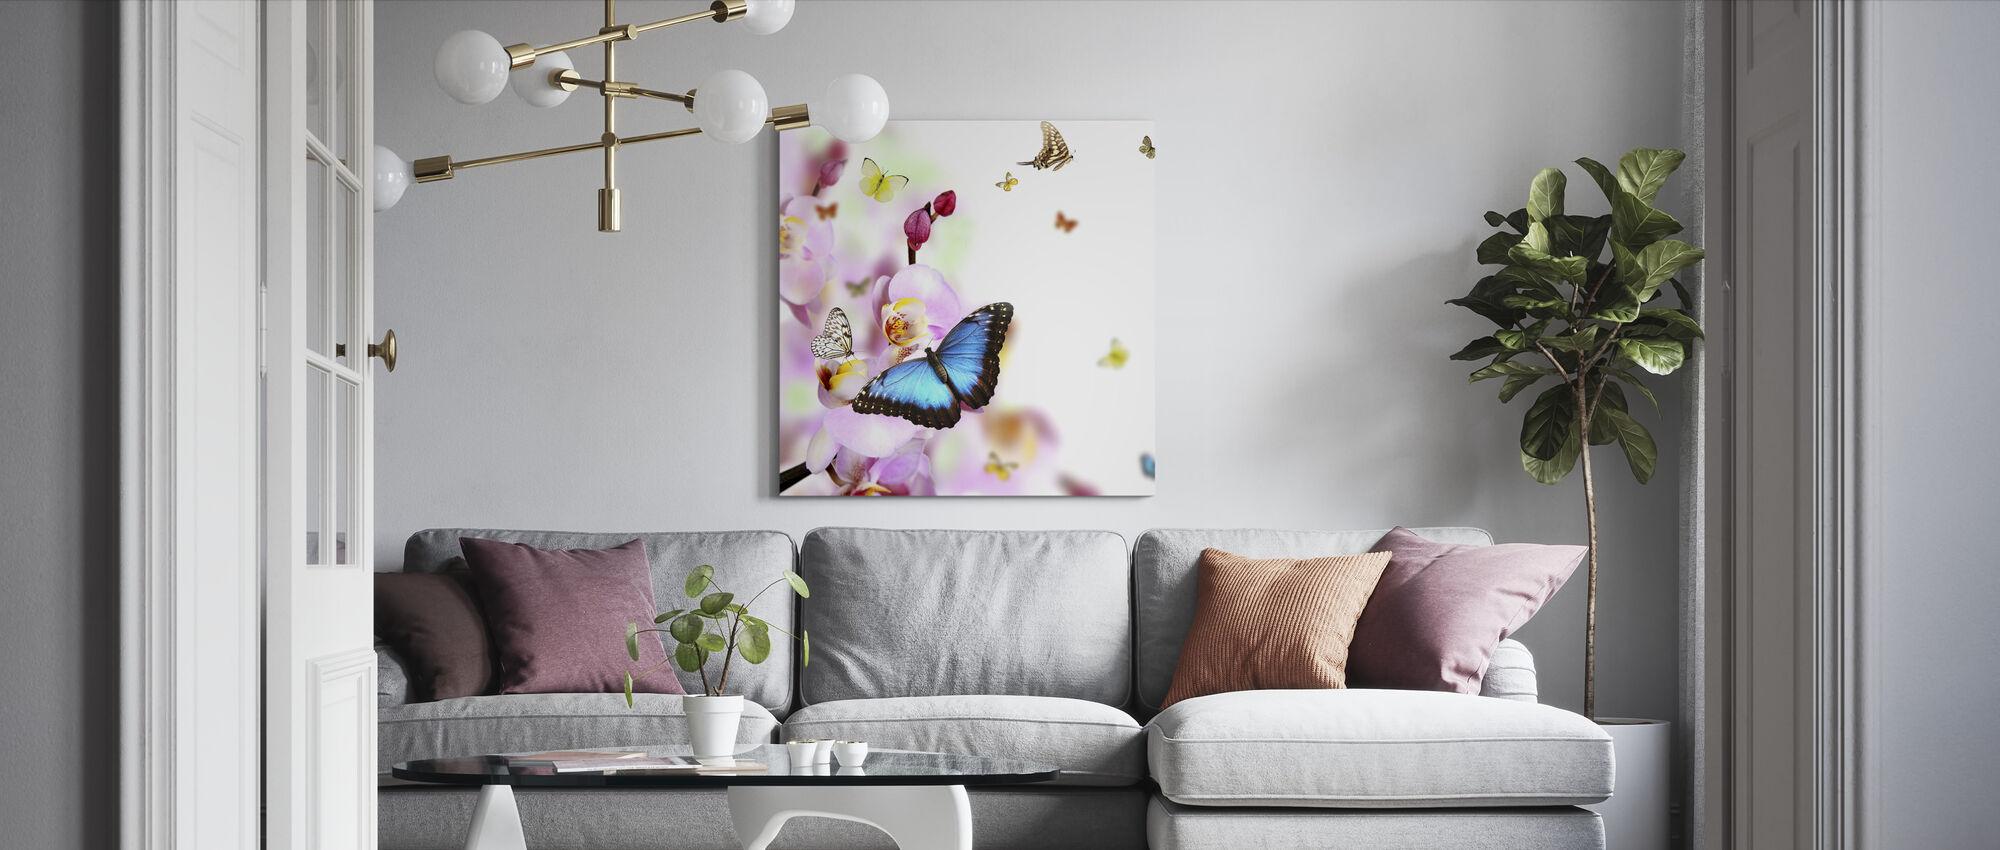 Perhoset ja orkidean kukat - Canvastaulu - Olohuone